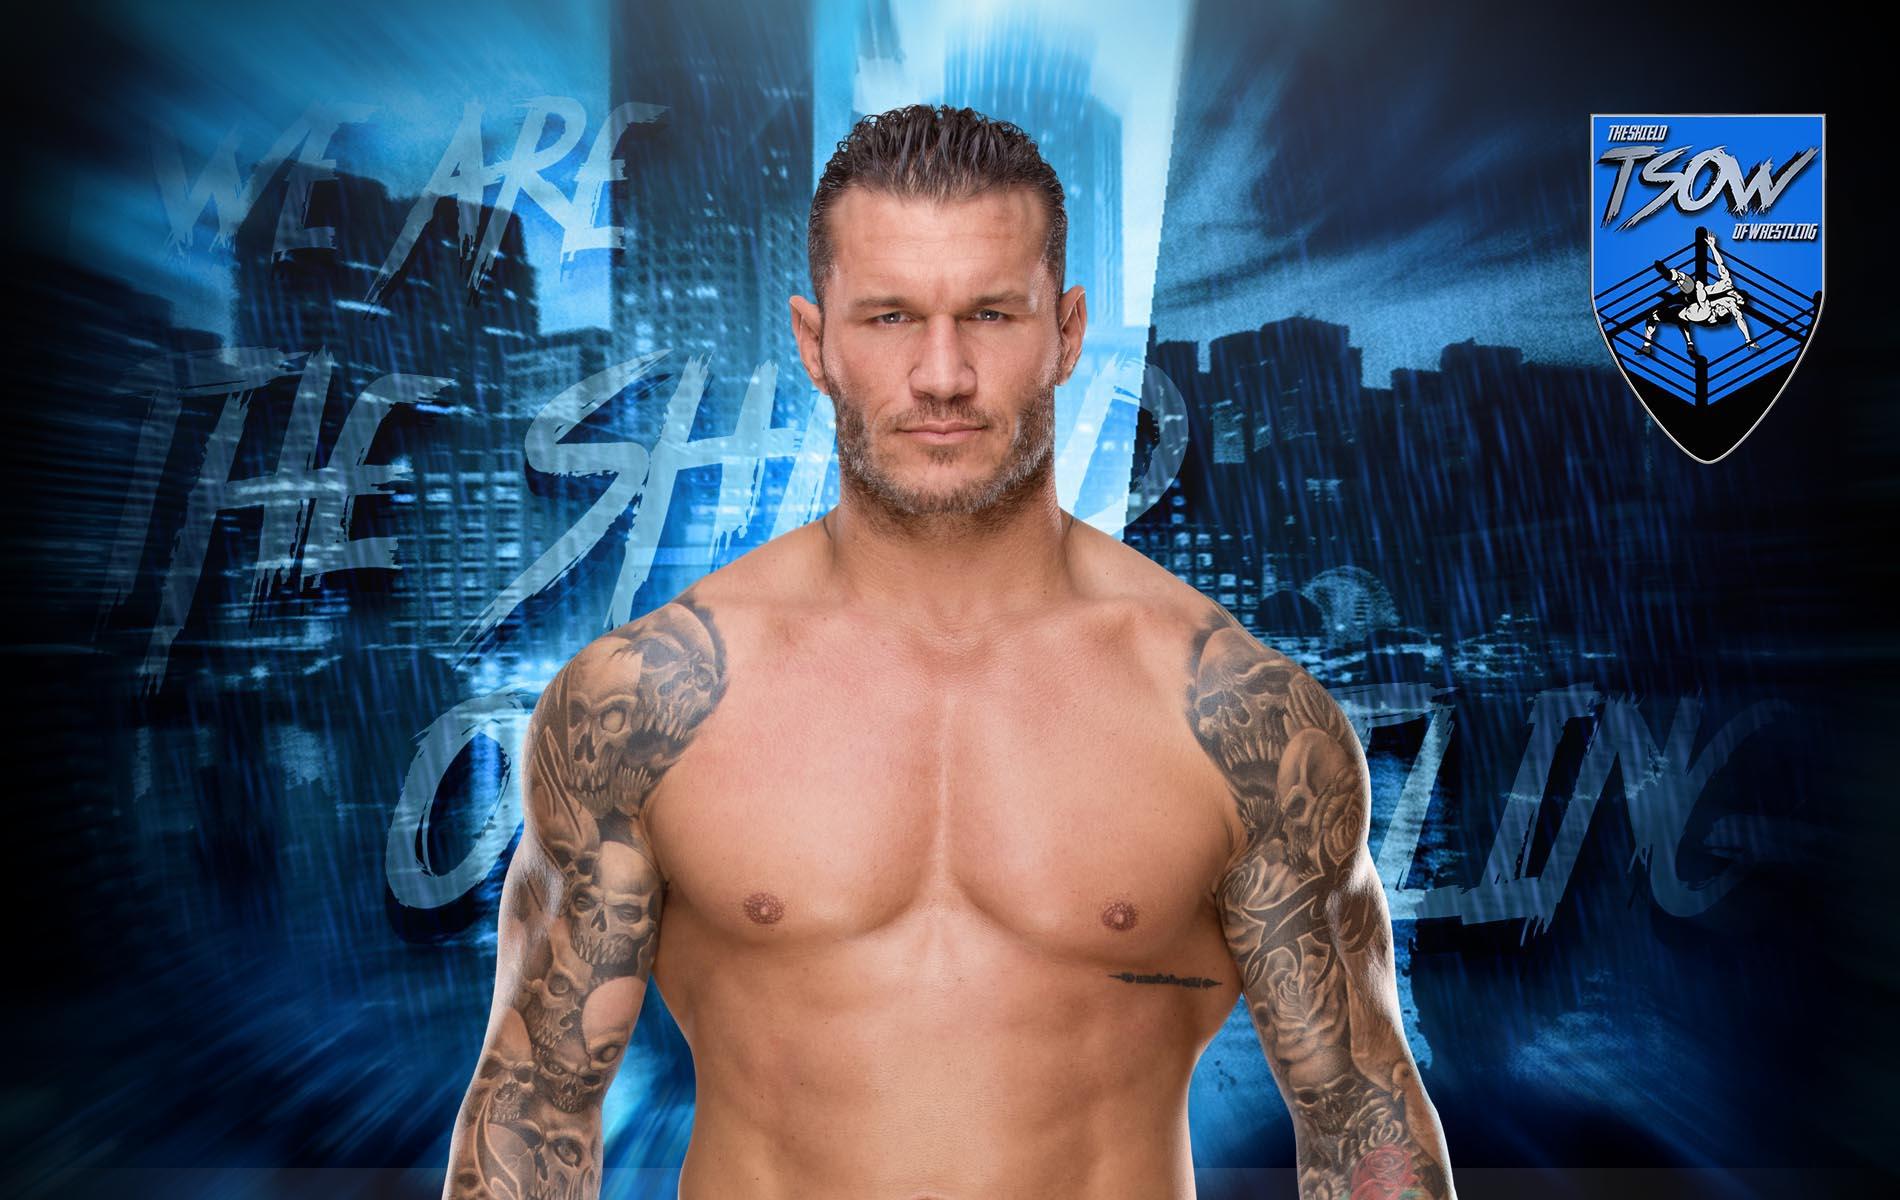 Randy Orton ammette di essere un gran fan di Goldberg